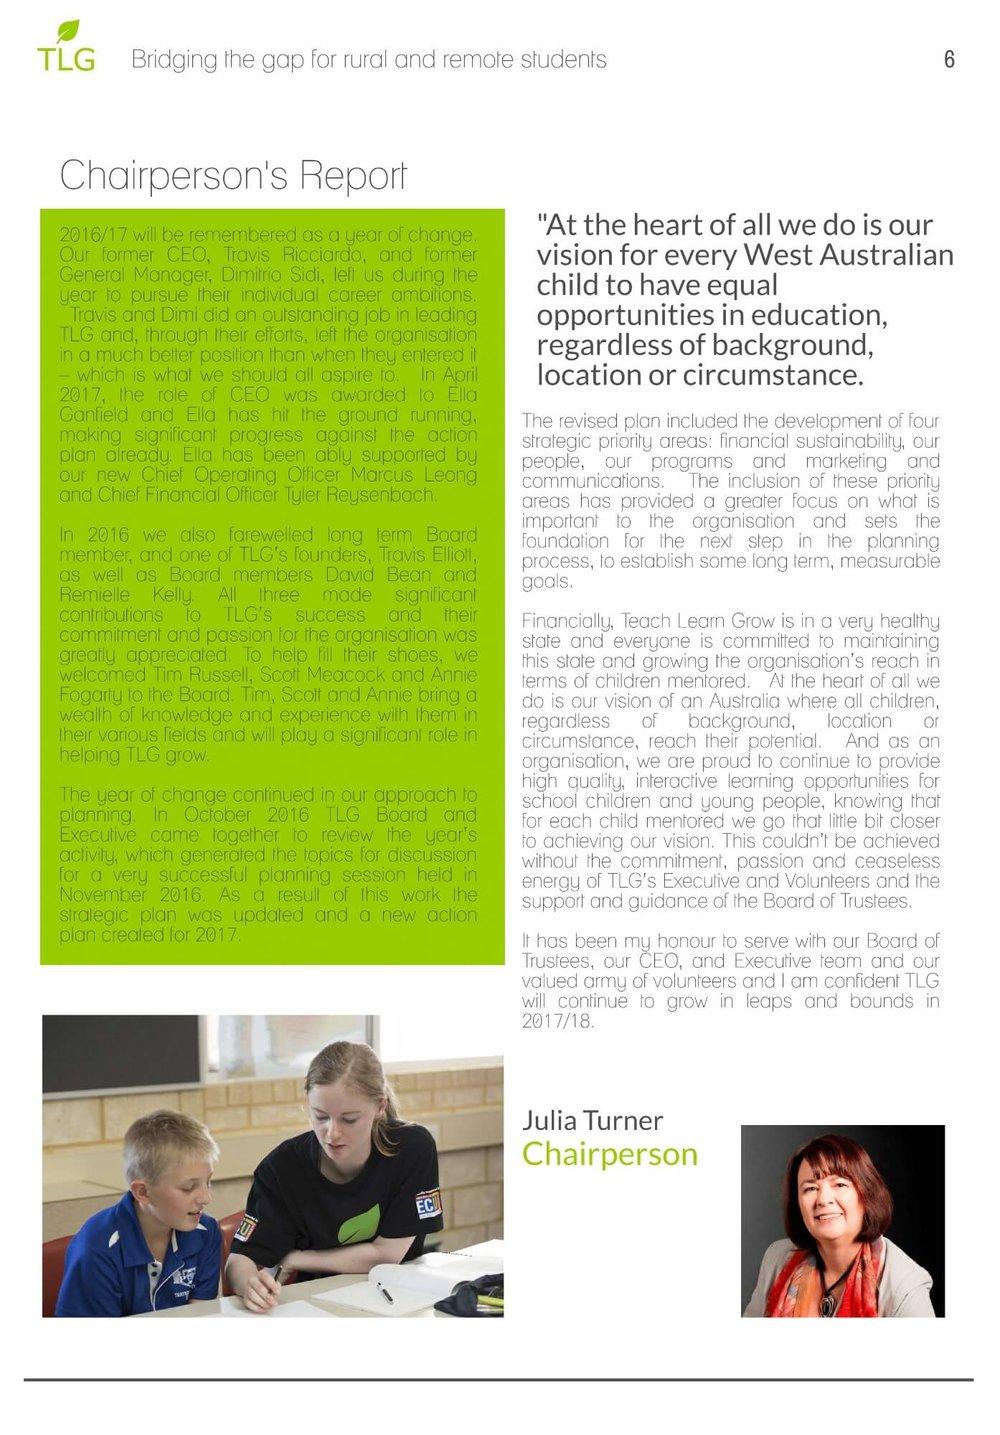 tlg-annual-report-FY16-06.jpg